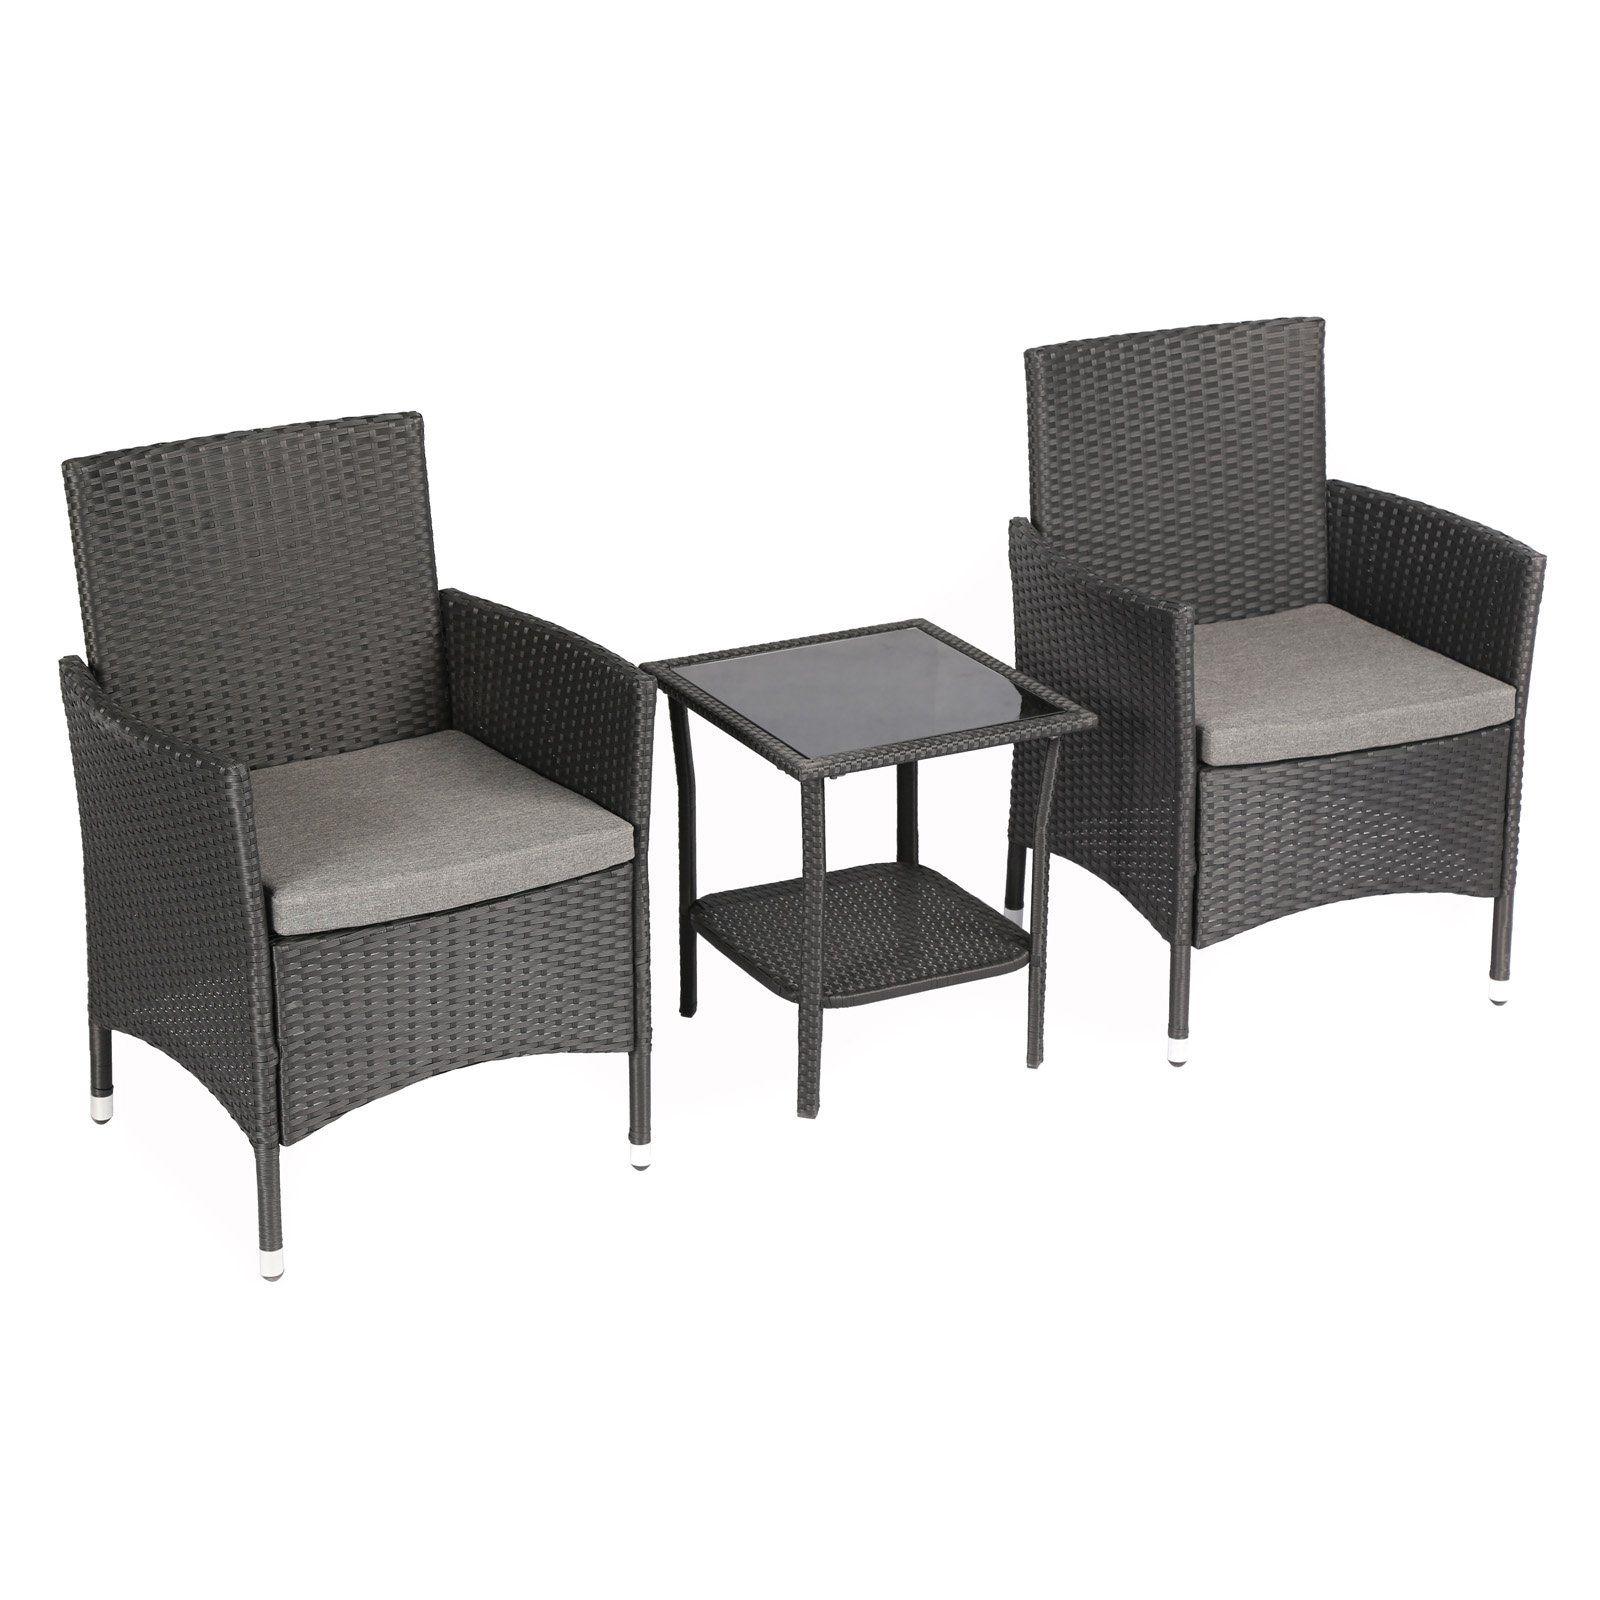 Furniture Modern Wicker 3 Piece Patio